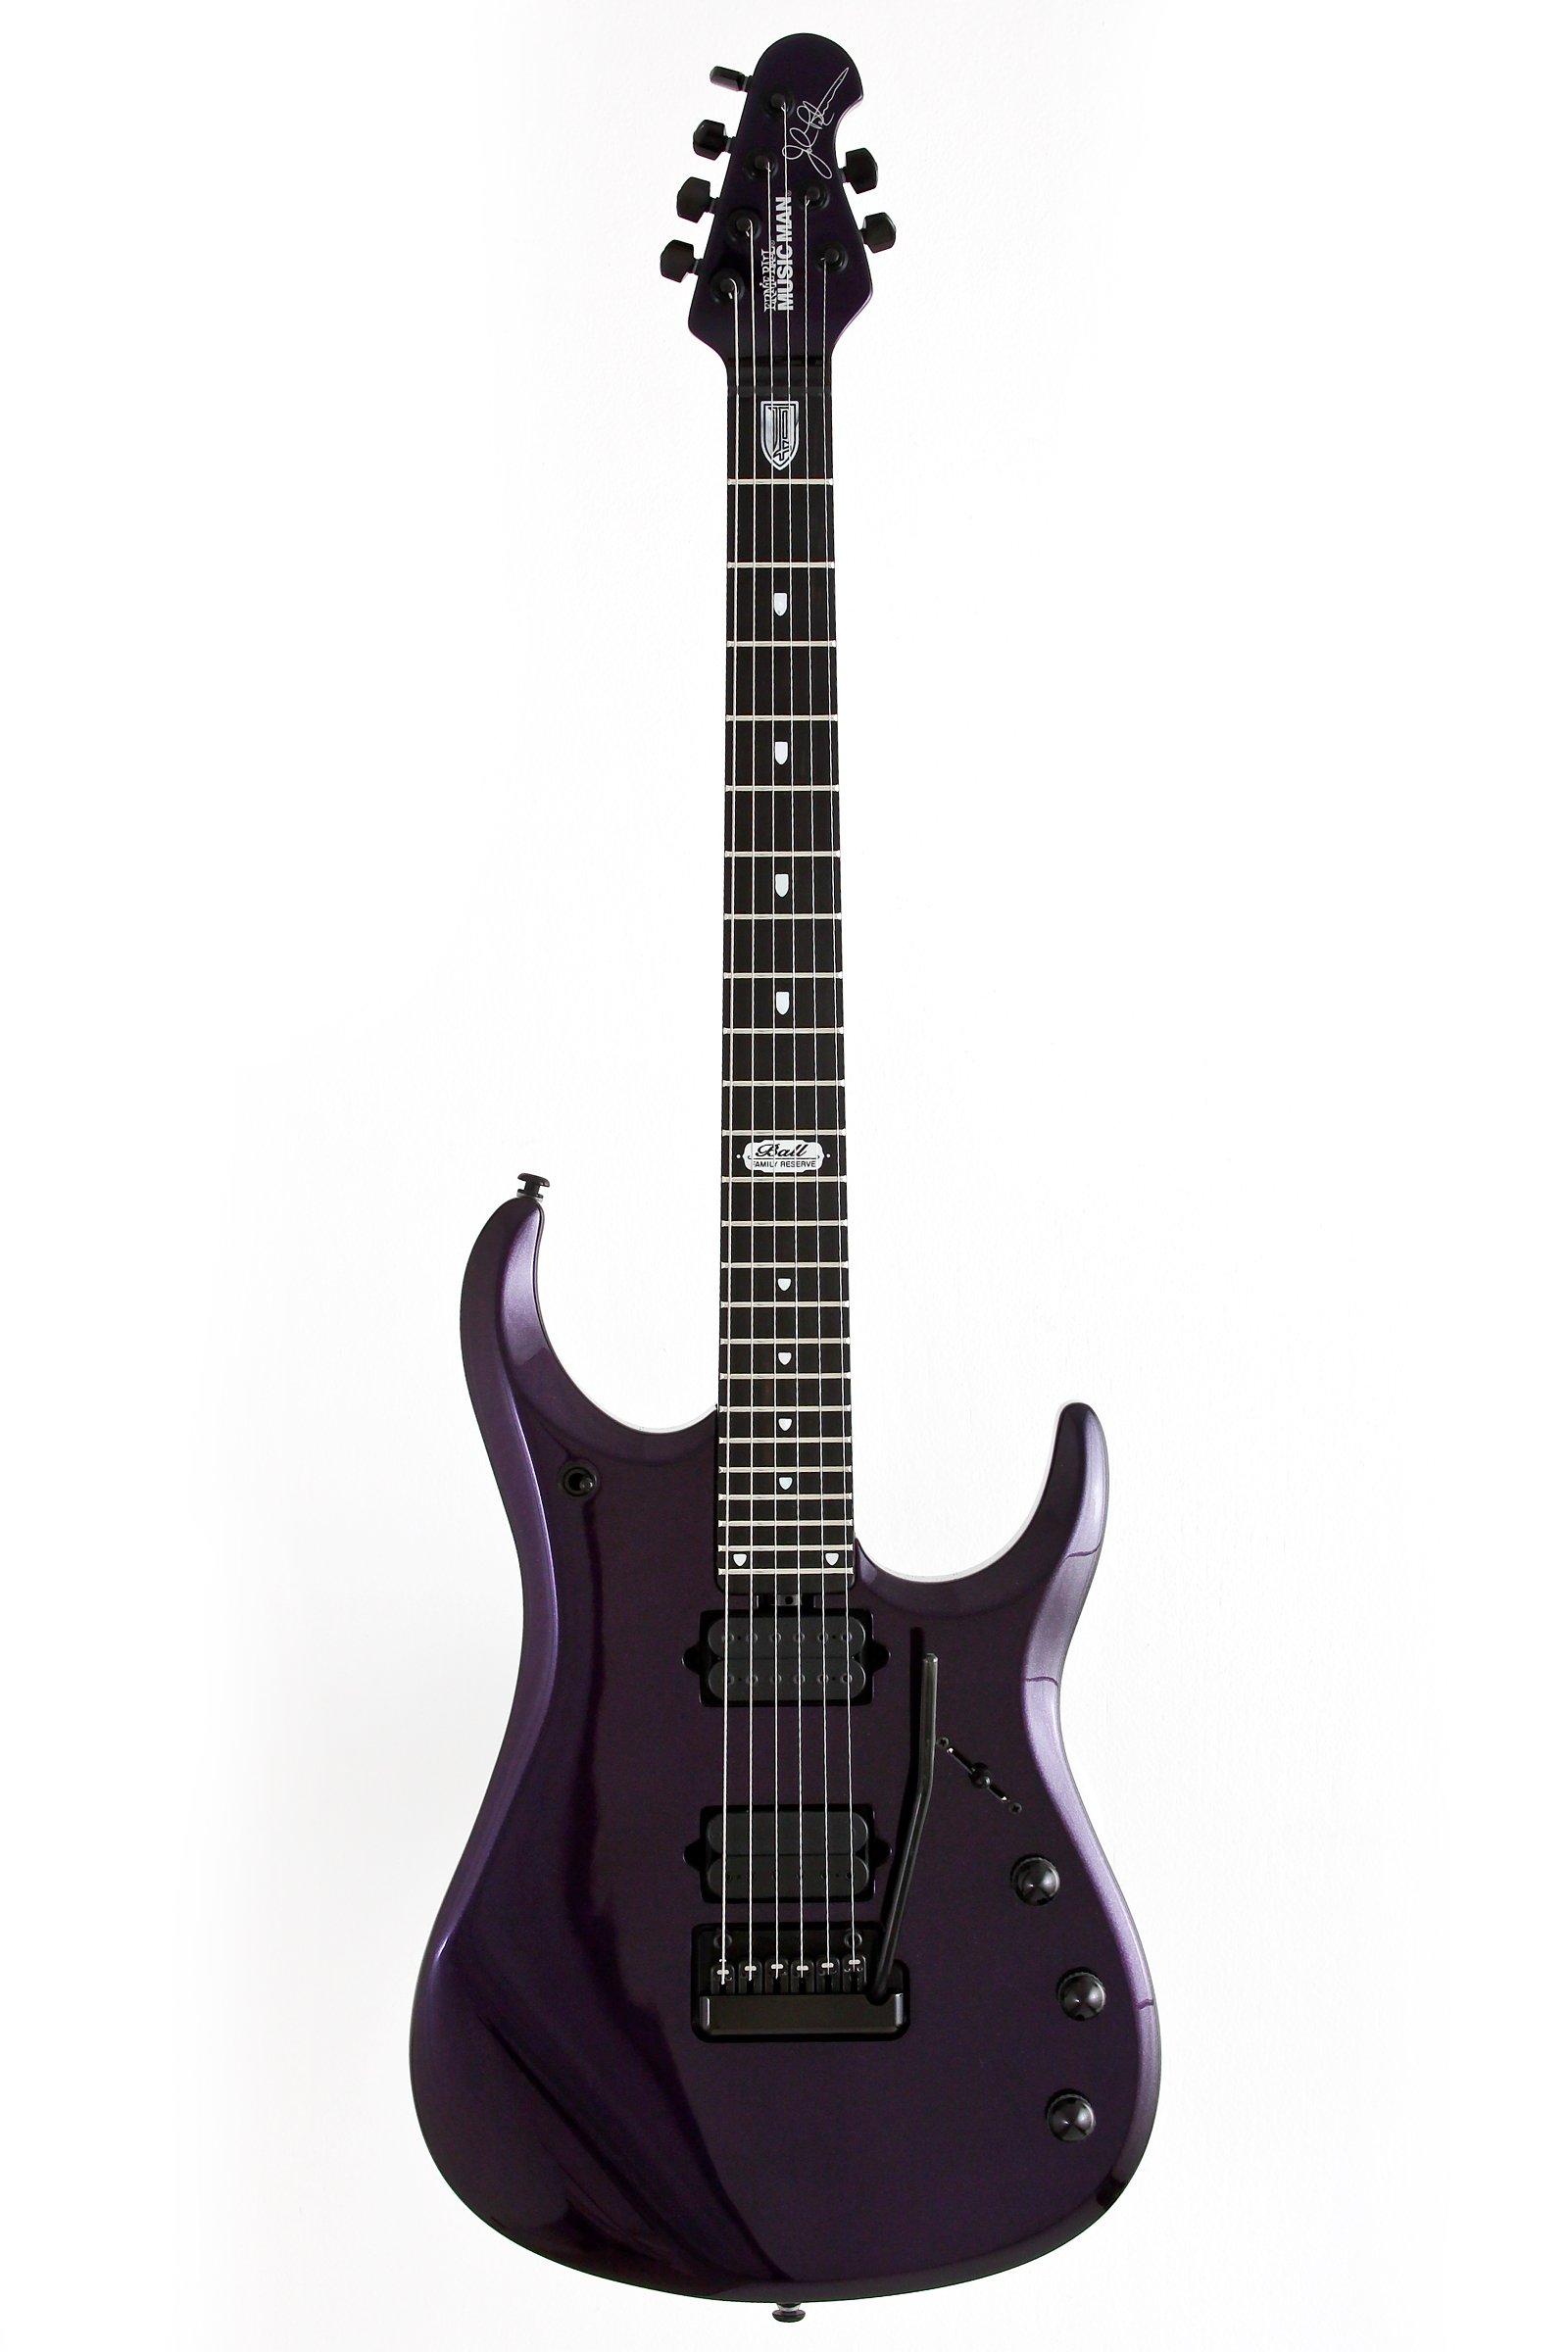 Ernie Ball Music Man John Petrucci JPX Electric Guitar - Two Humbucker Barolo Color Mahogany Neck Ebony Fretboard Black Hardware